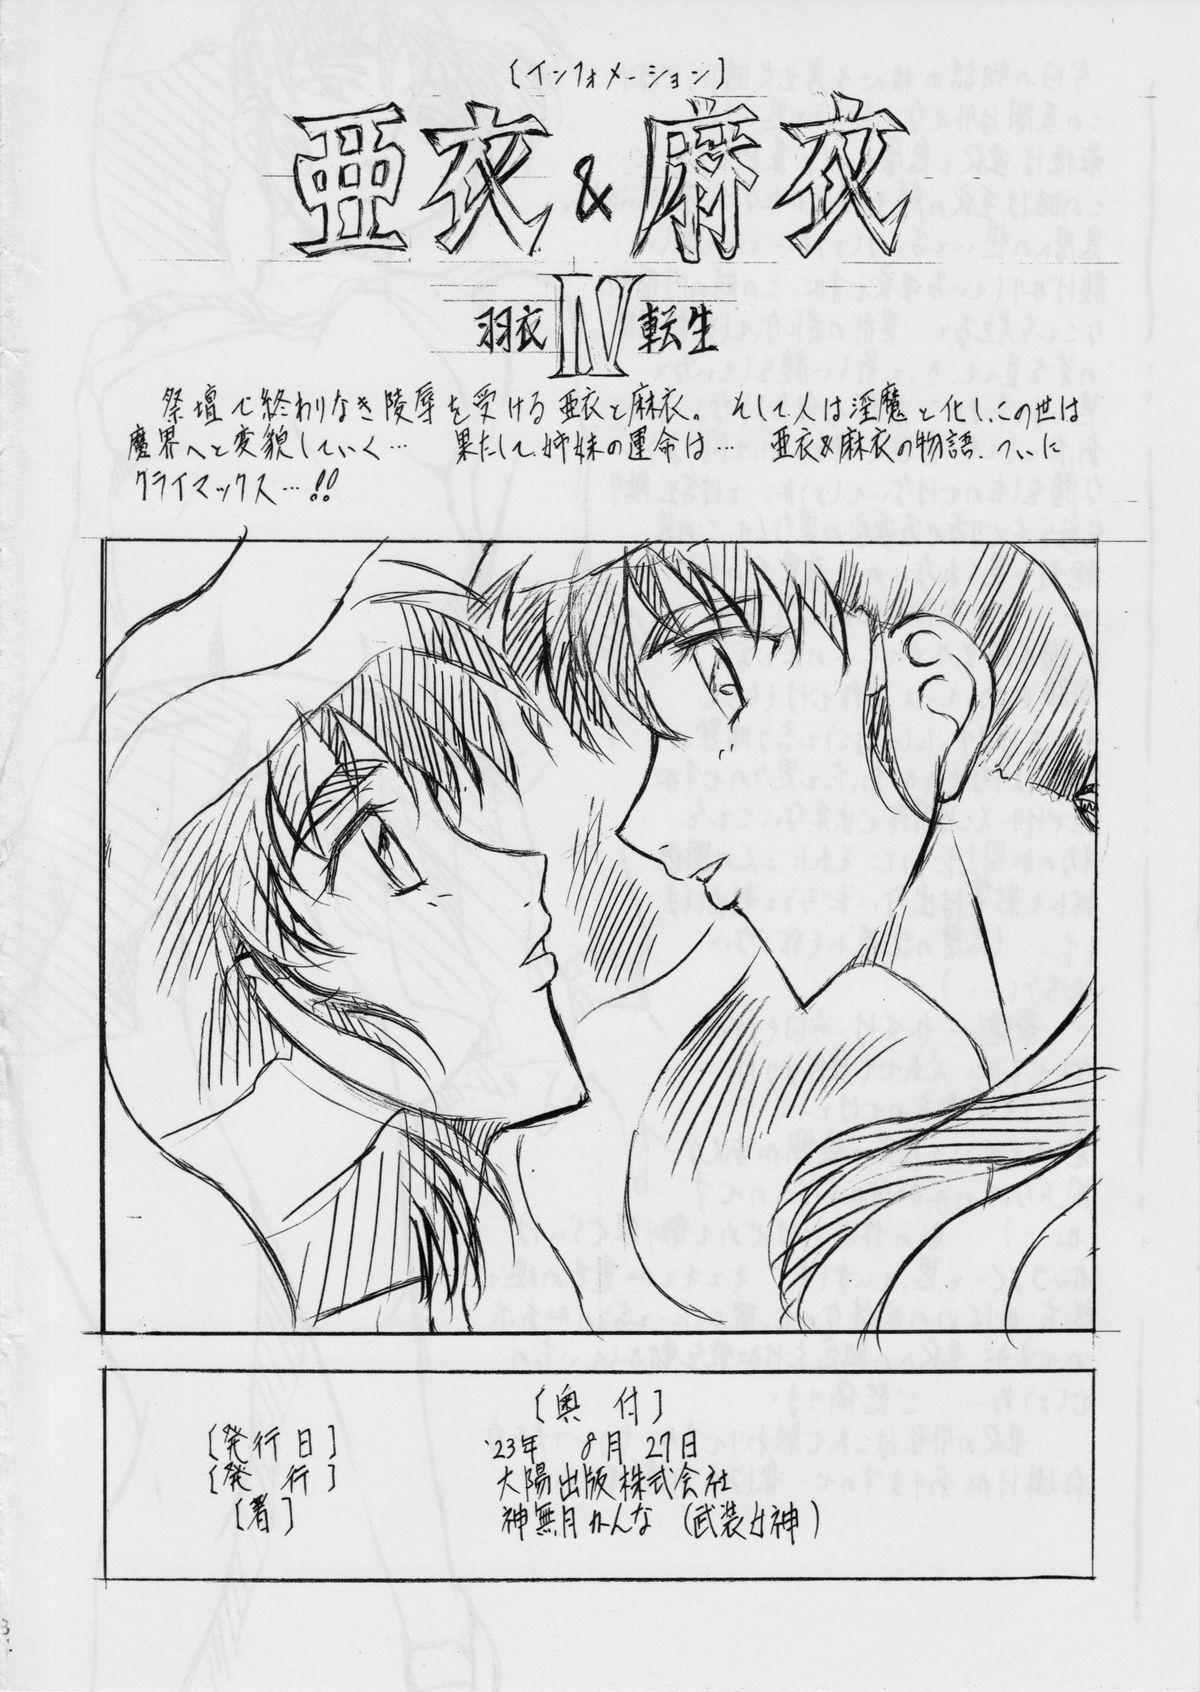 [Busou Megami (Kannaduki Kanna)] Ai & Mai Gaiden -Aoki Seido-Kouhen- (Inju Seisen Twin Angels) 34